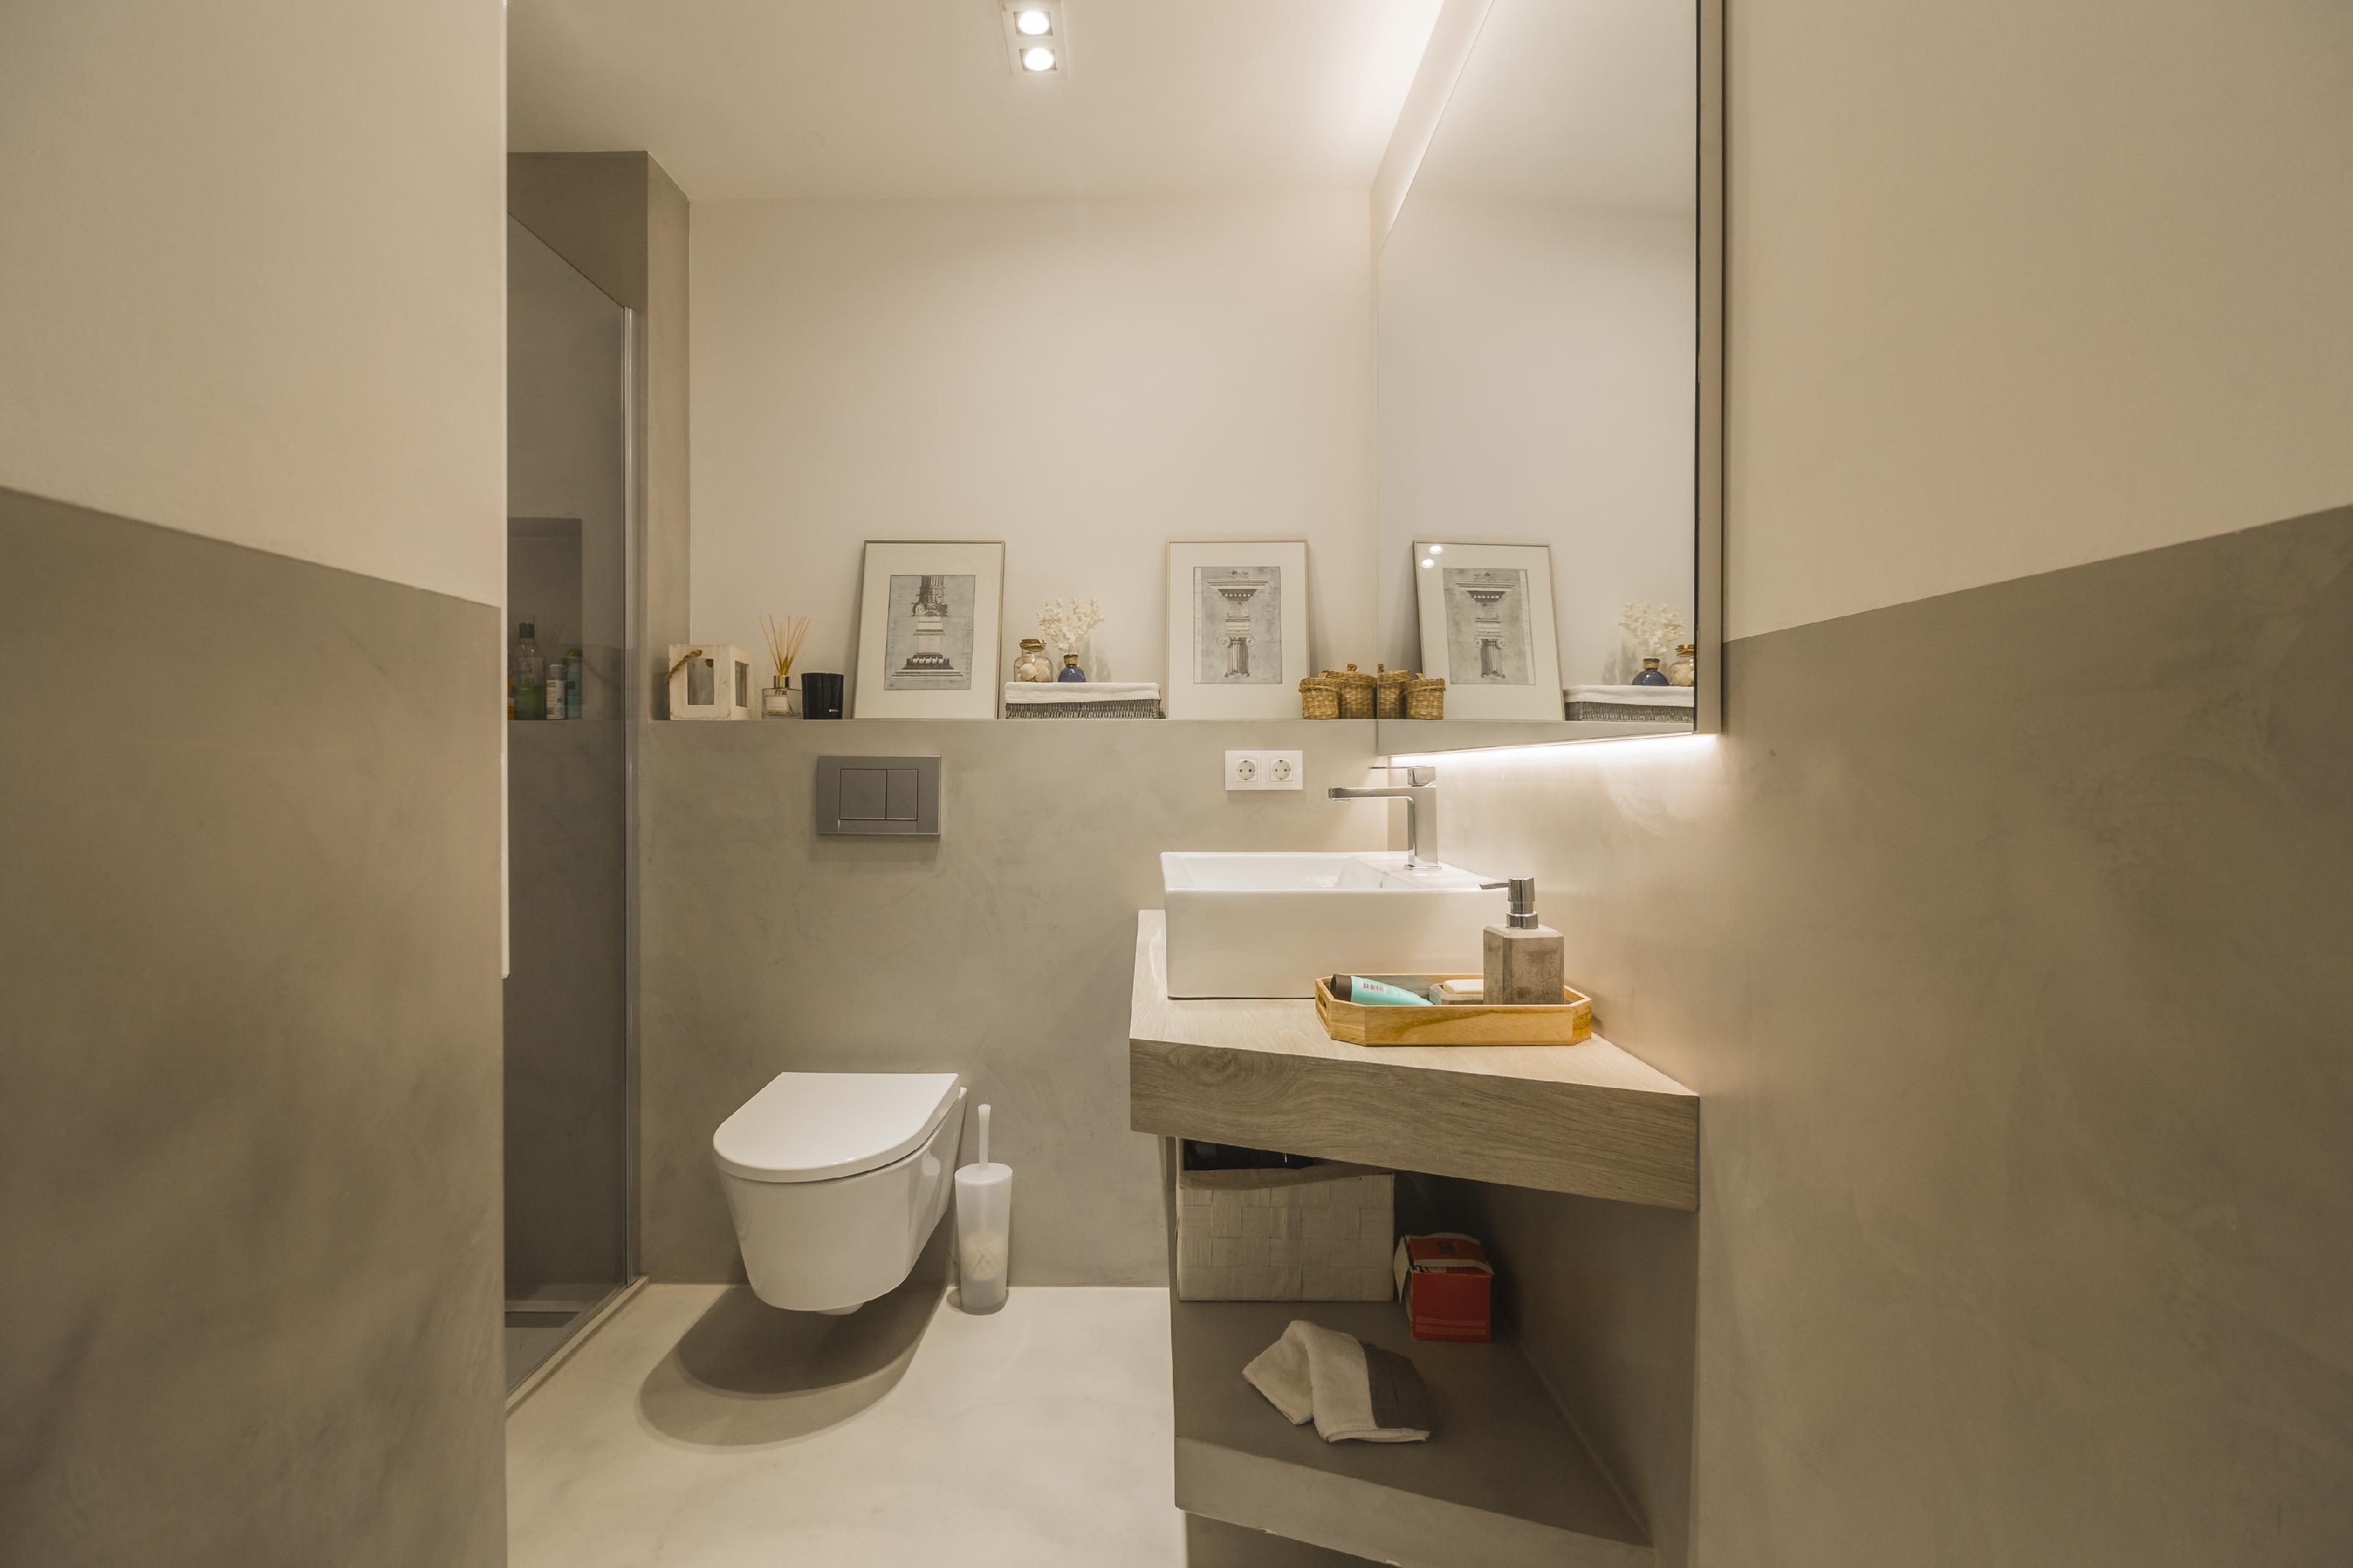 244392 Flat for sale in Sarrià-Sant Gervasi, Sant Gervasi-Galvany 31